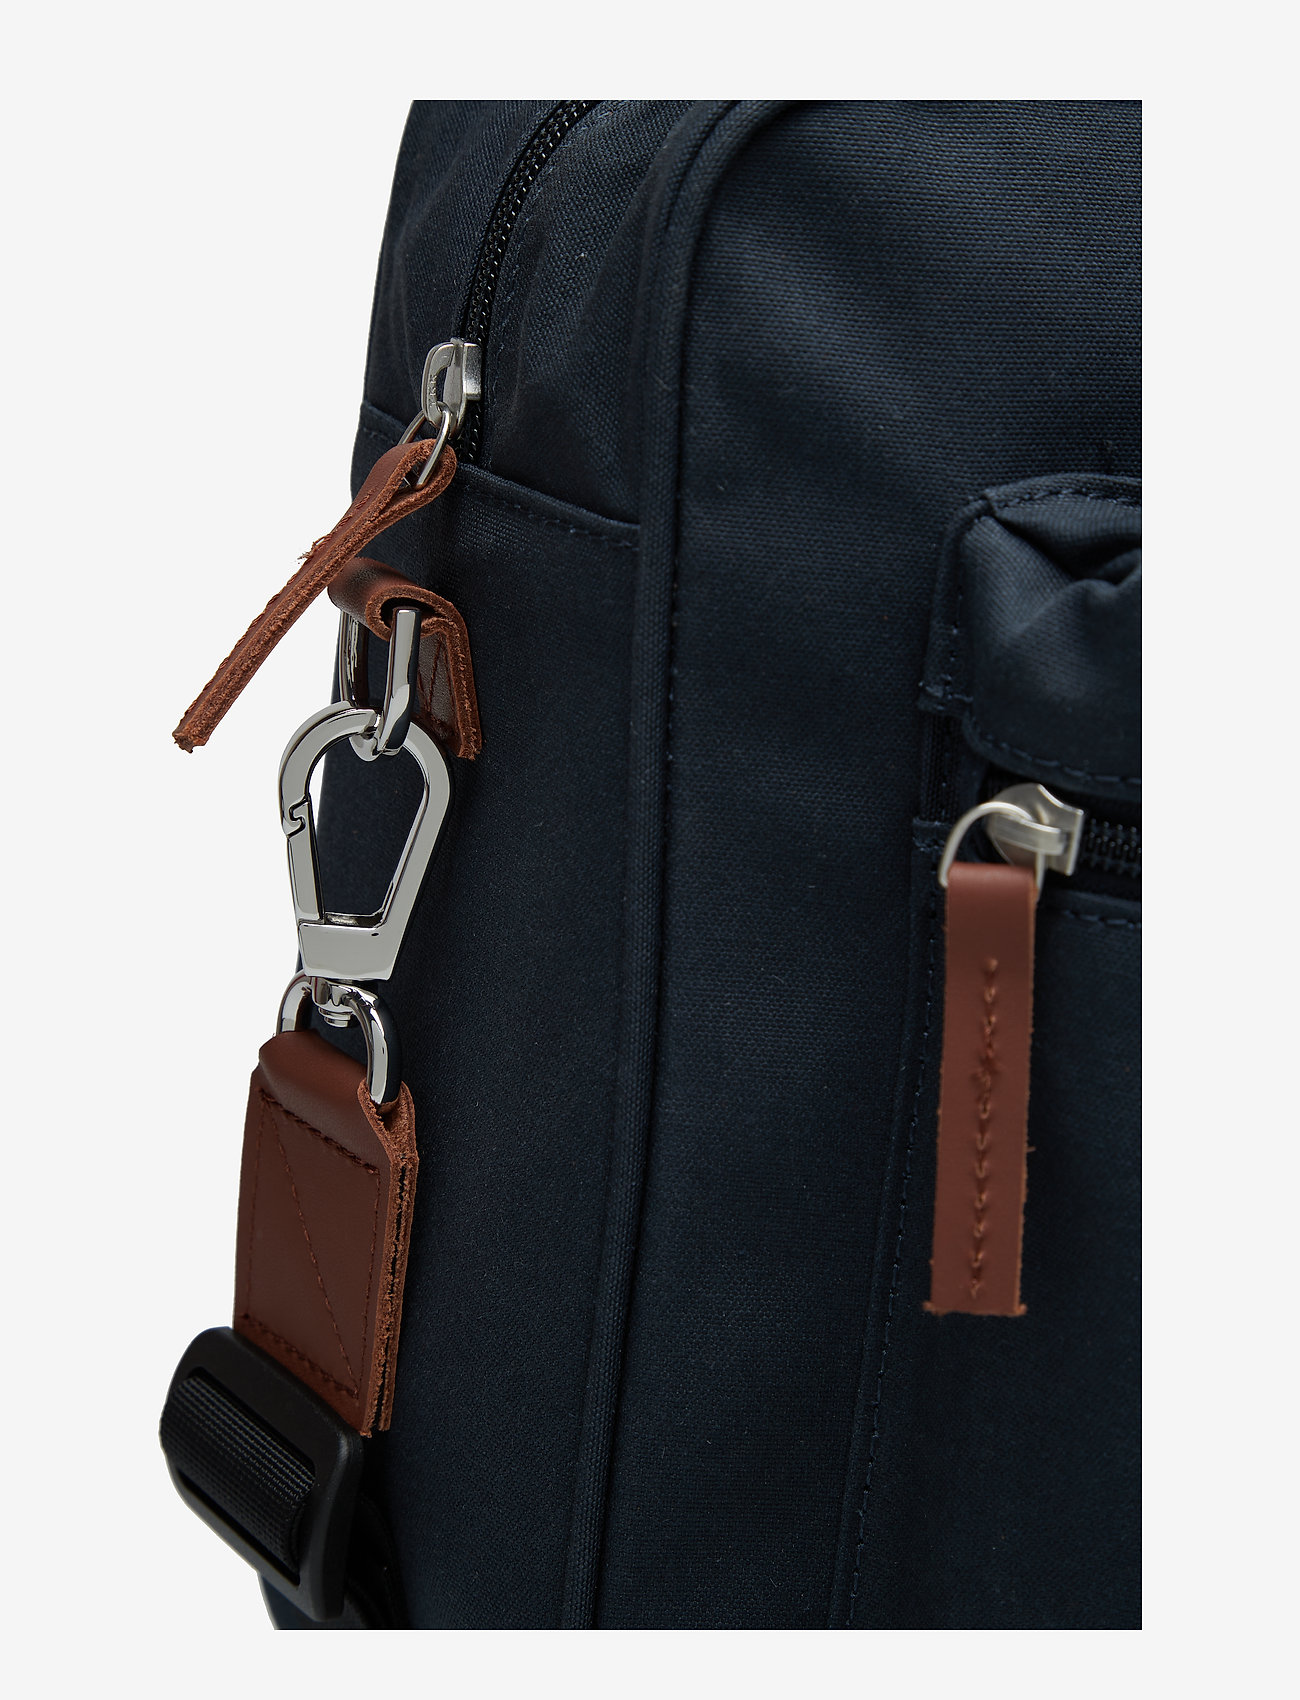 SANDQVIST - EMIL - navy with cognac brown leather - 5